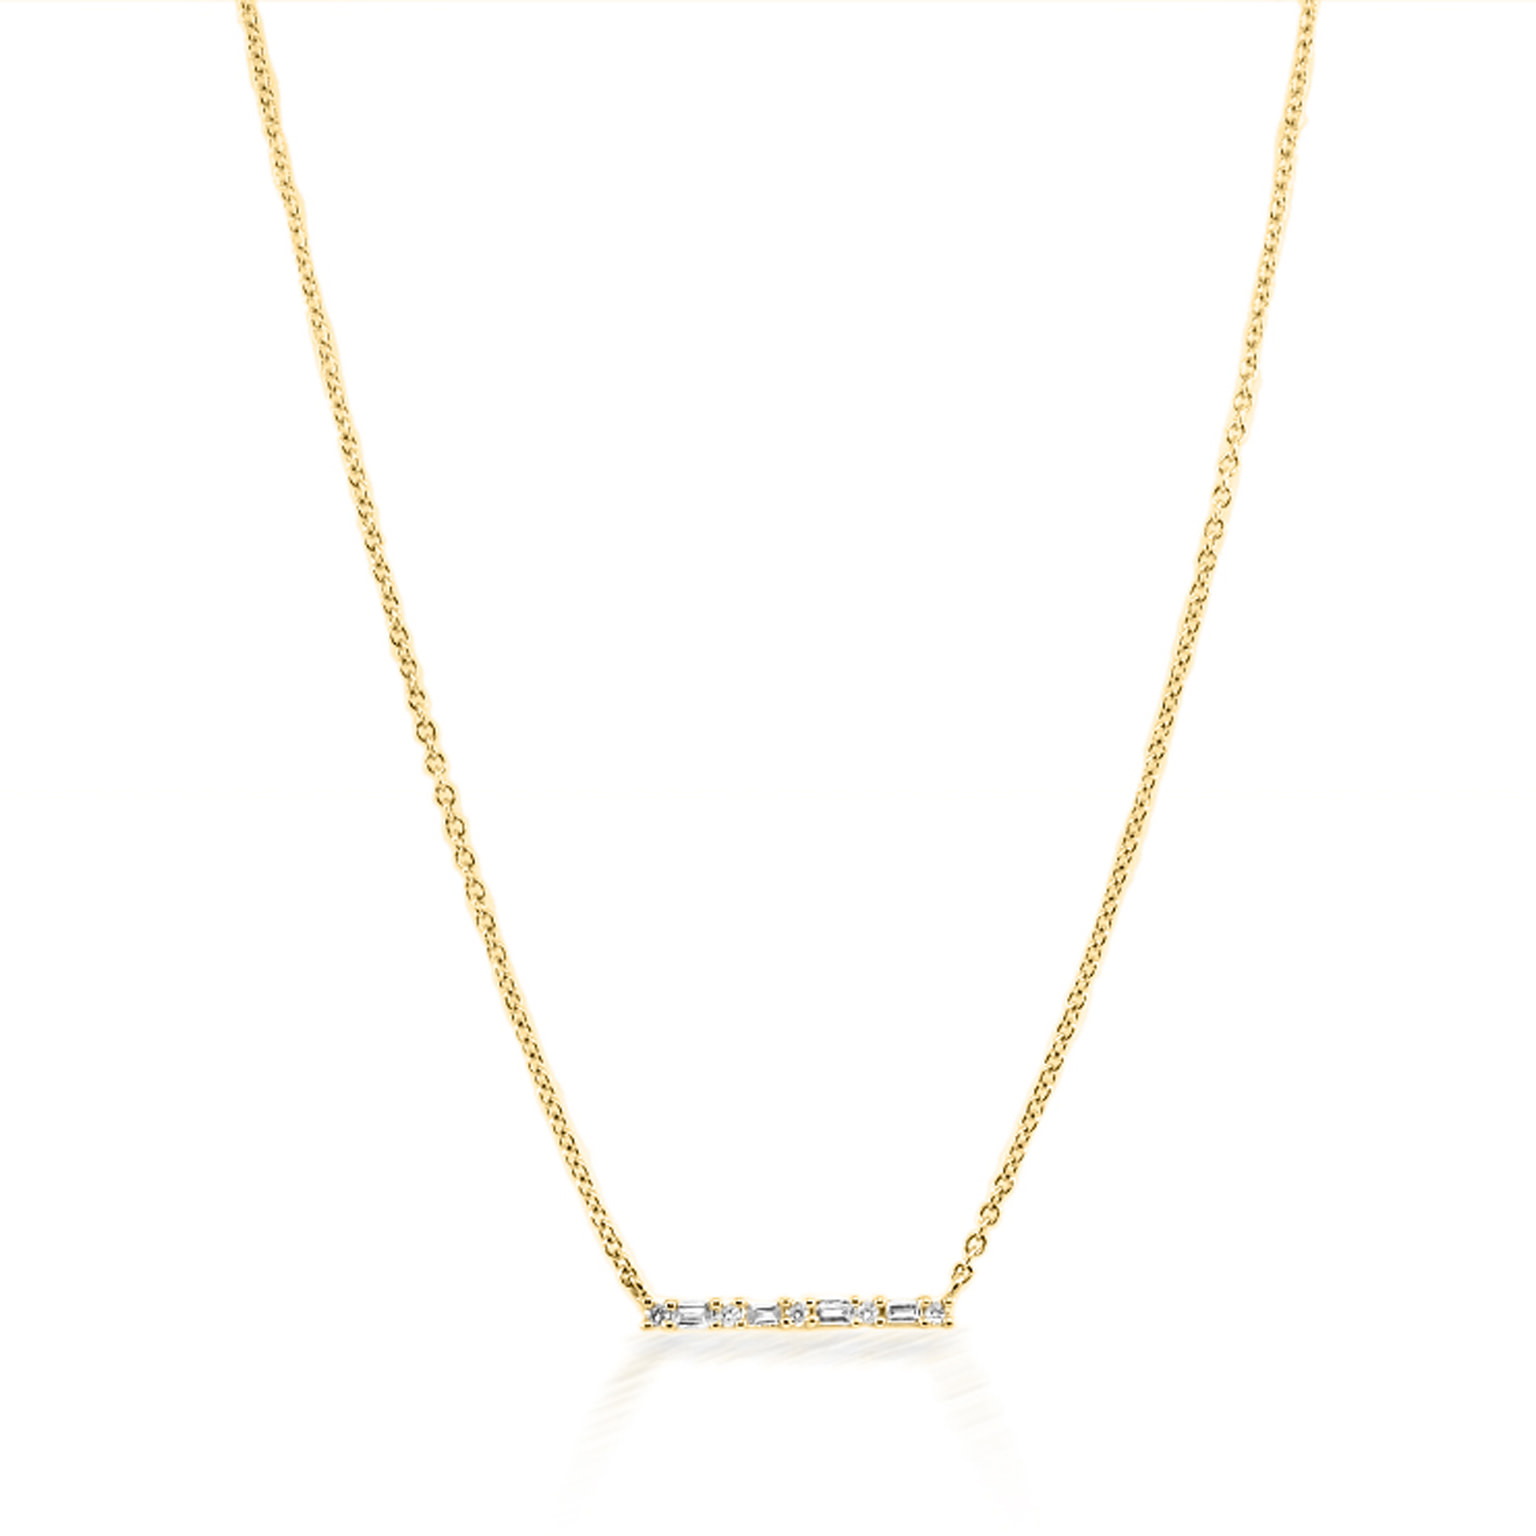 Trabert Goldsmiths Baguette and Round Diamond Bar Necklace